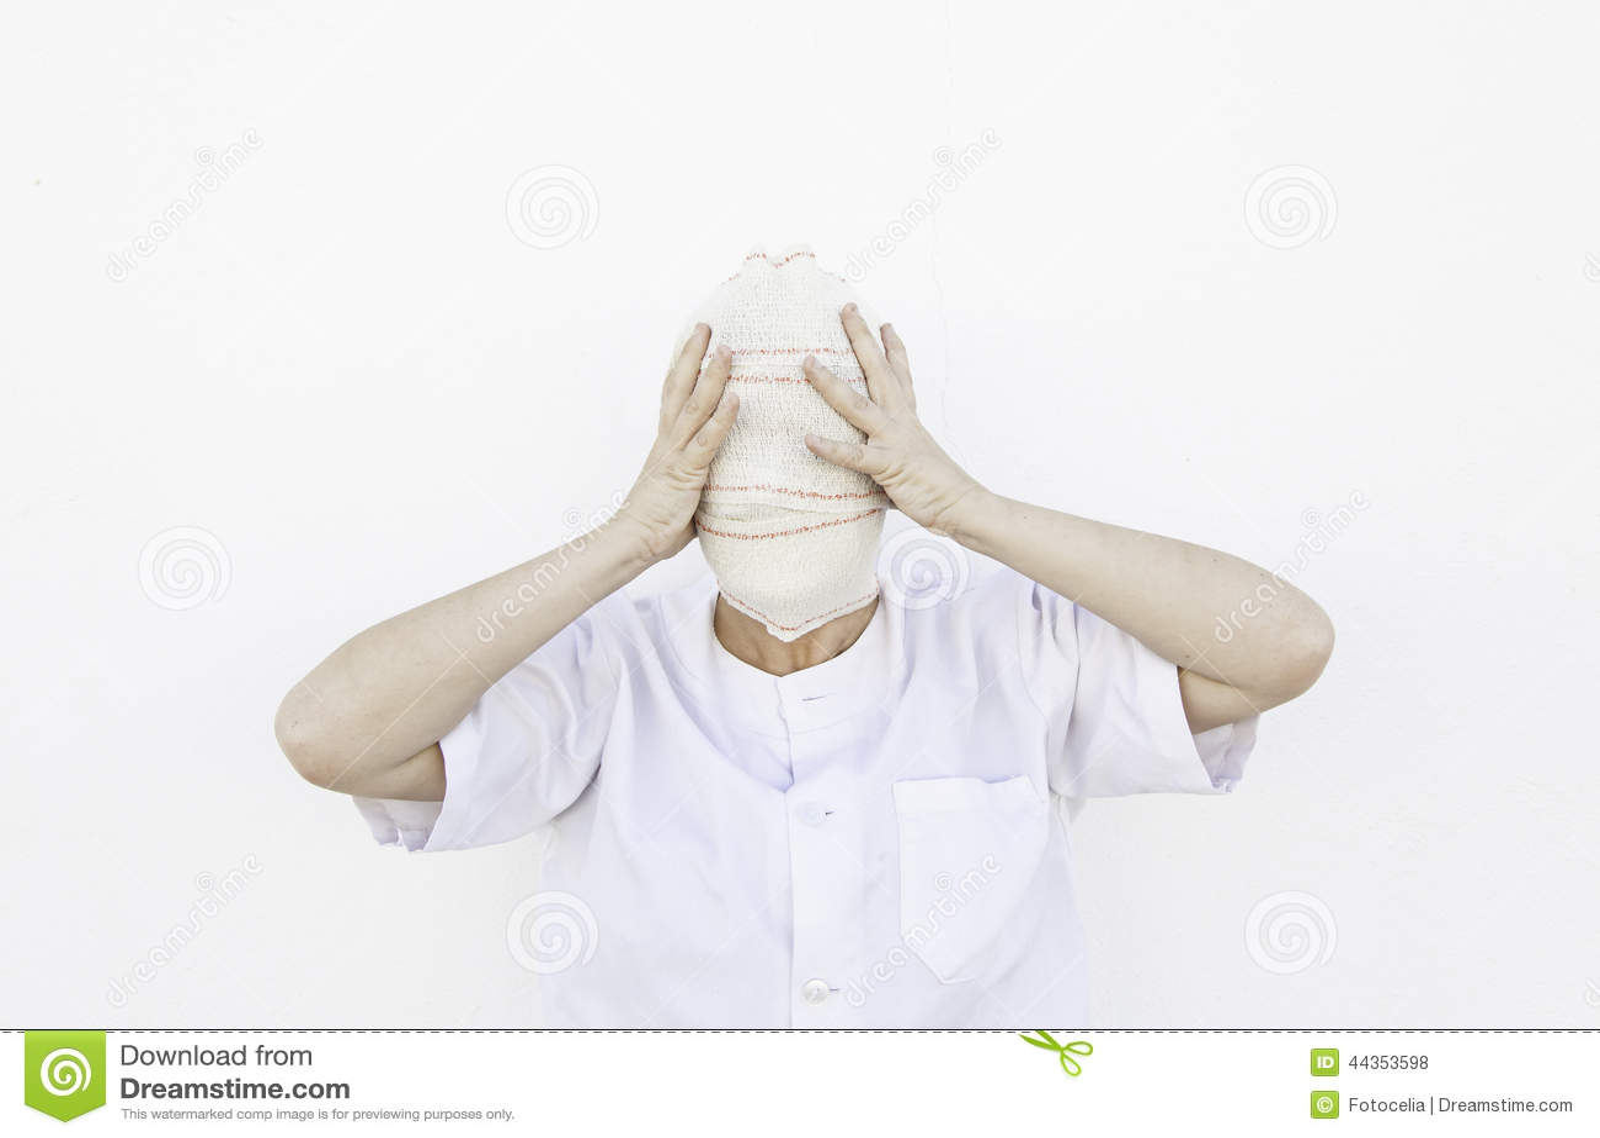 Persona bendata